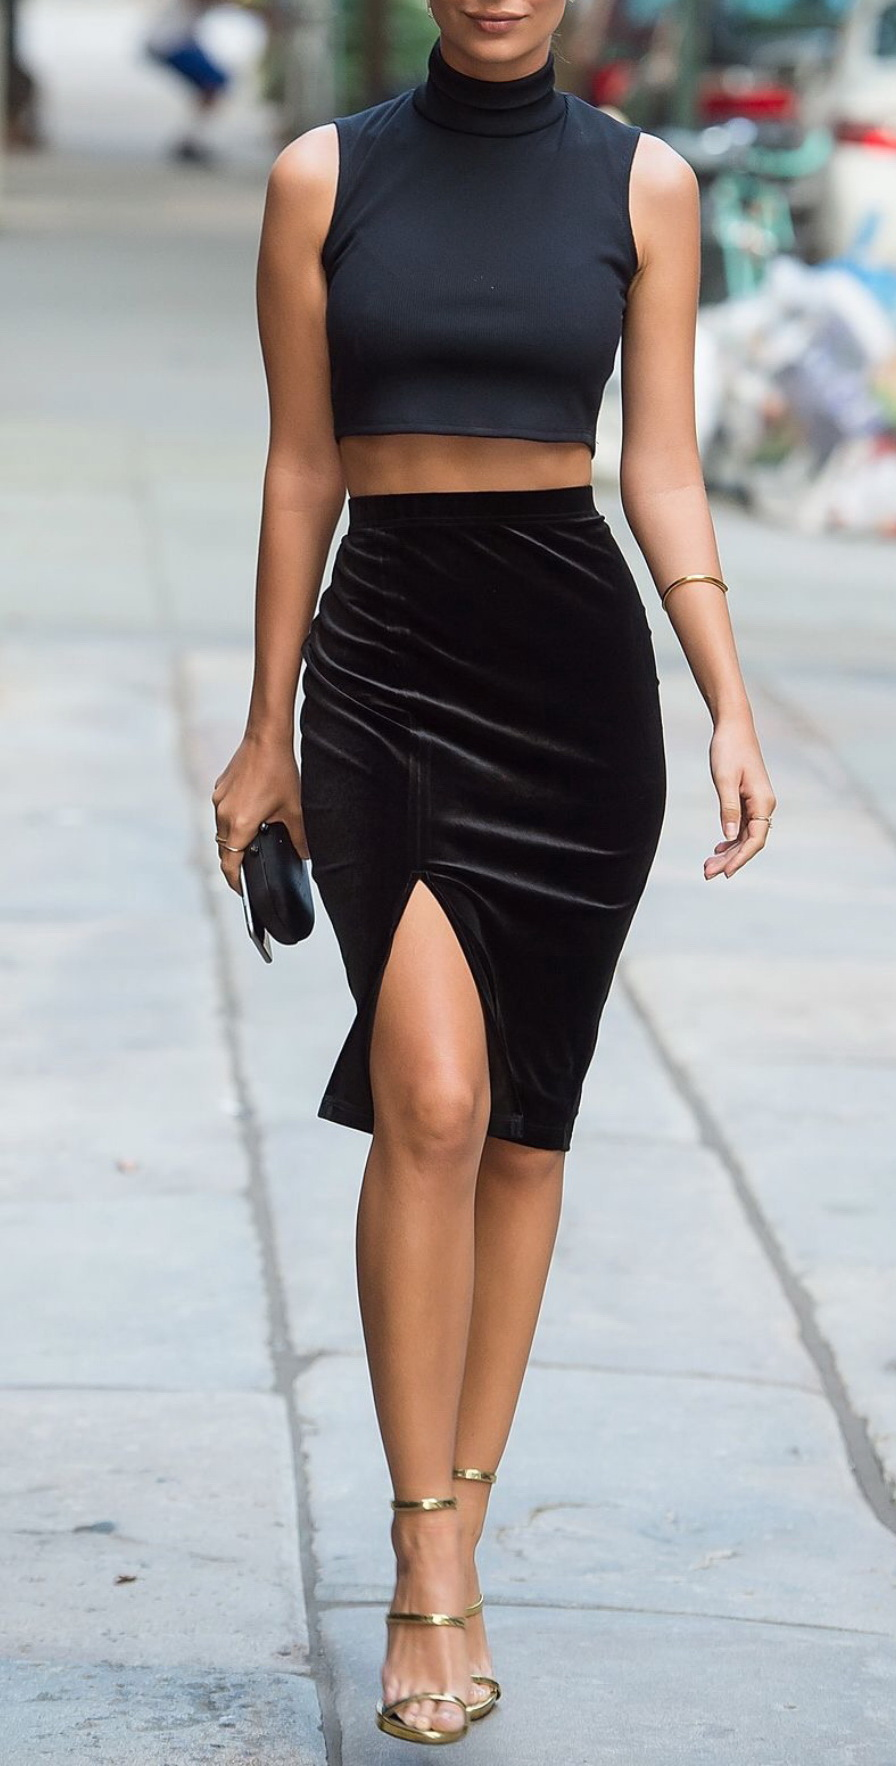 http://www.popsugar.co.uk/fashion/Emily-Ratajkowski-Wears-Primark-Better-Than-We-Ever-Could-38292551